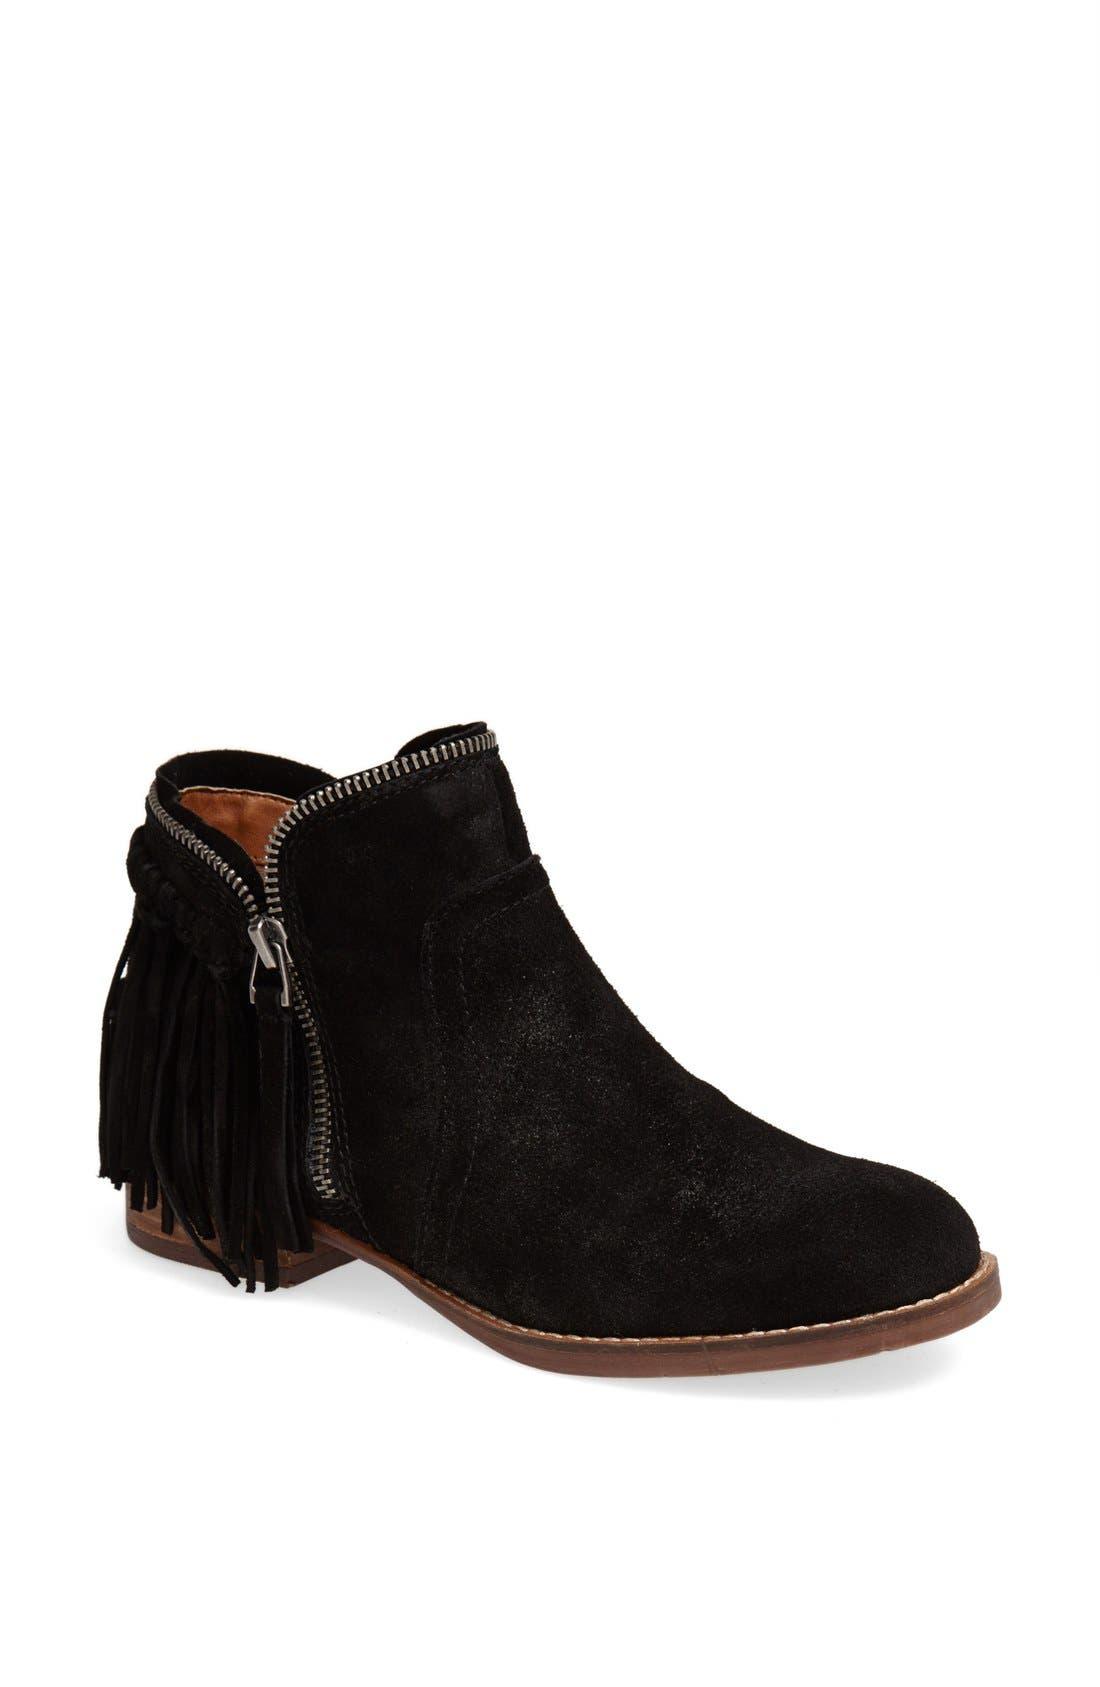 DV Footwear 'Fisher' Bootie,                         Main,                         color, 004